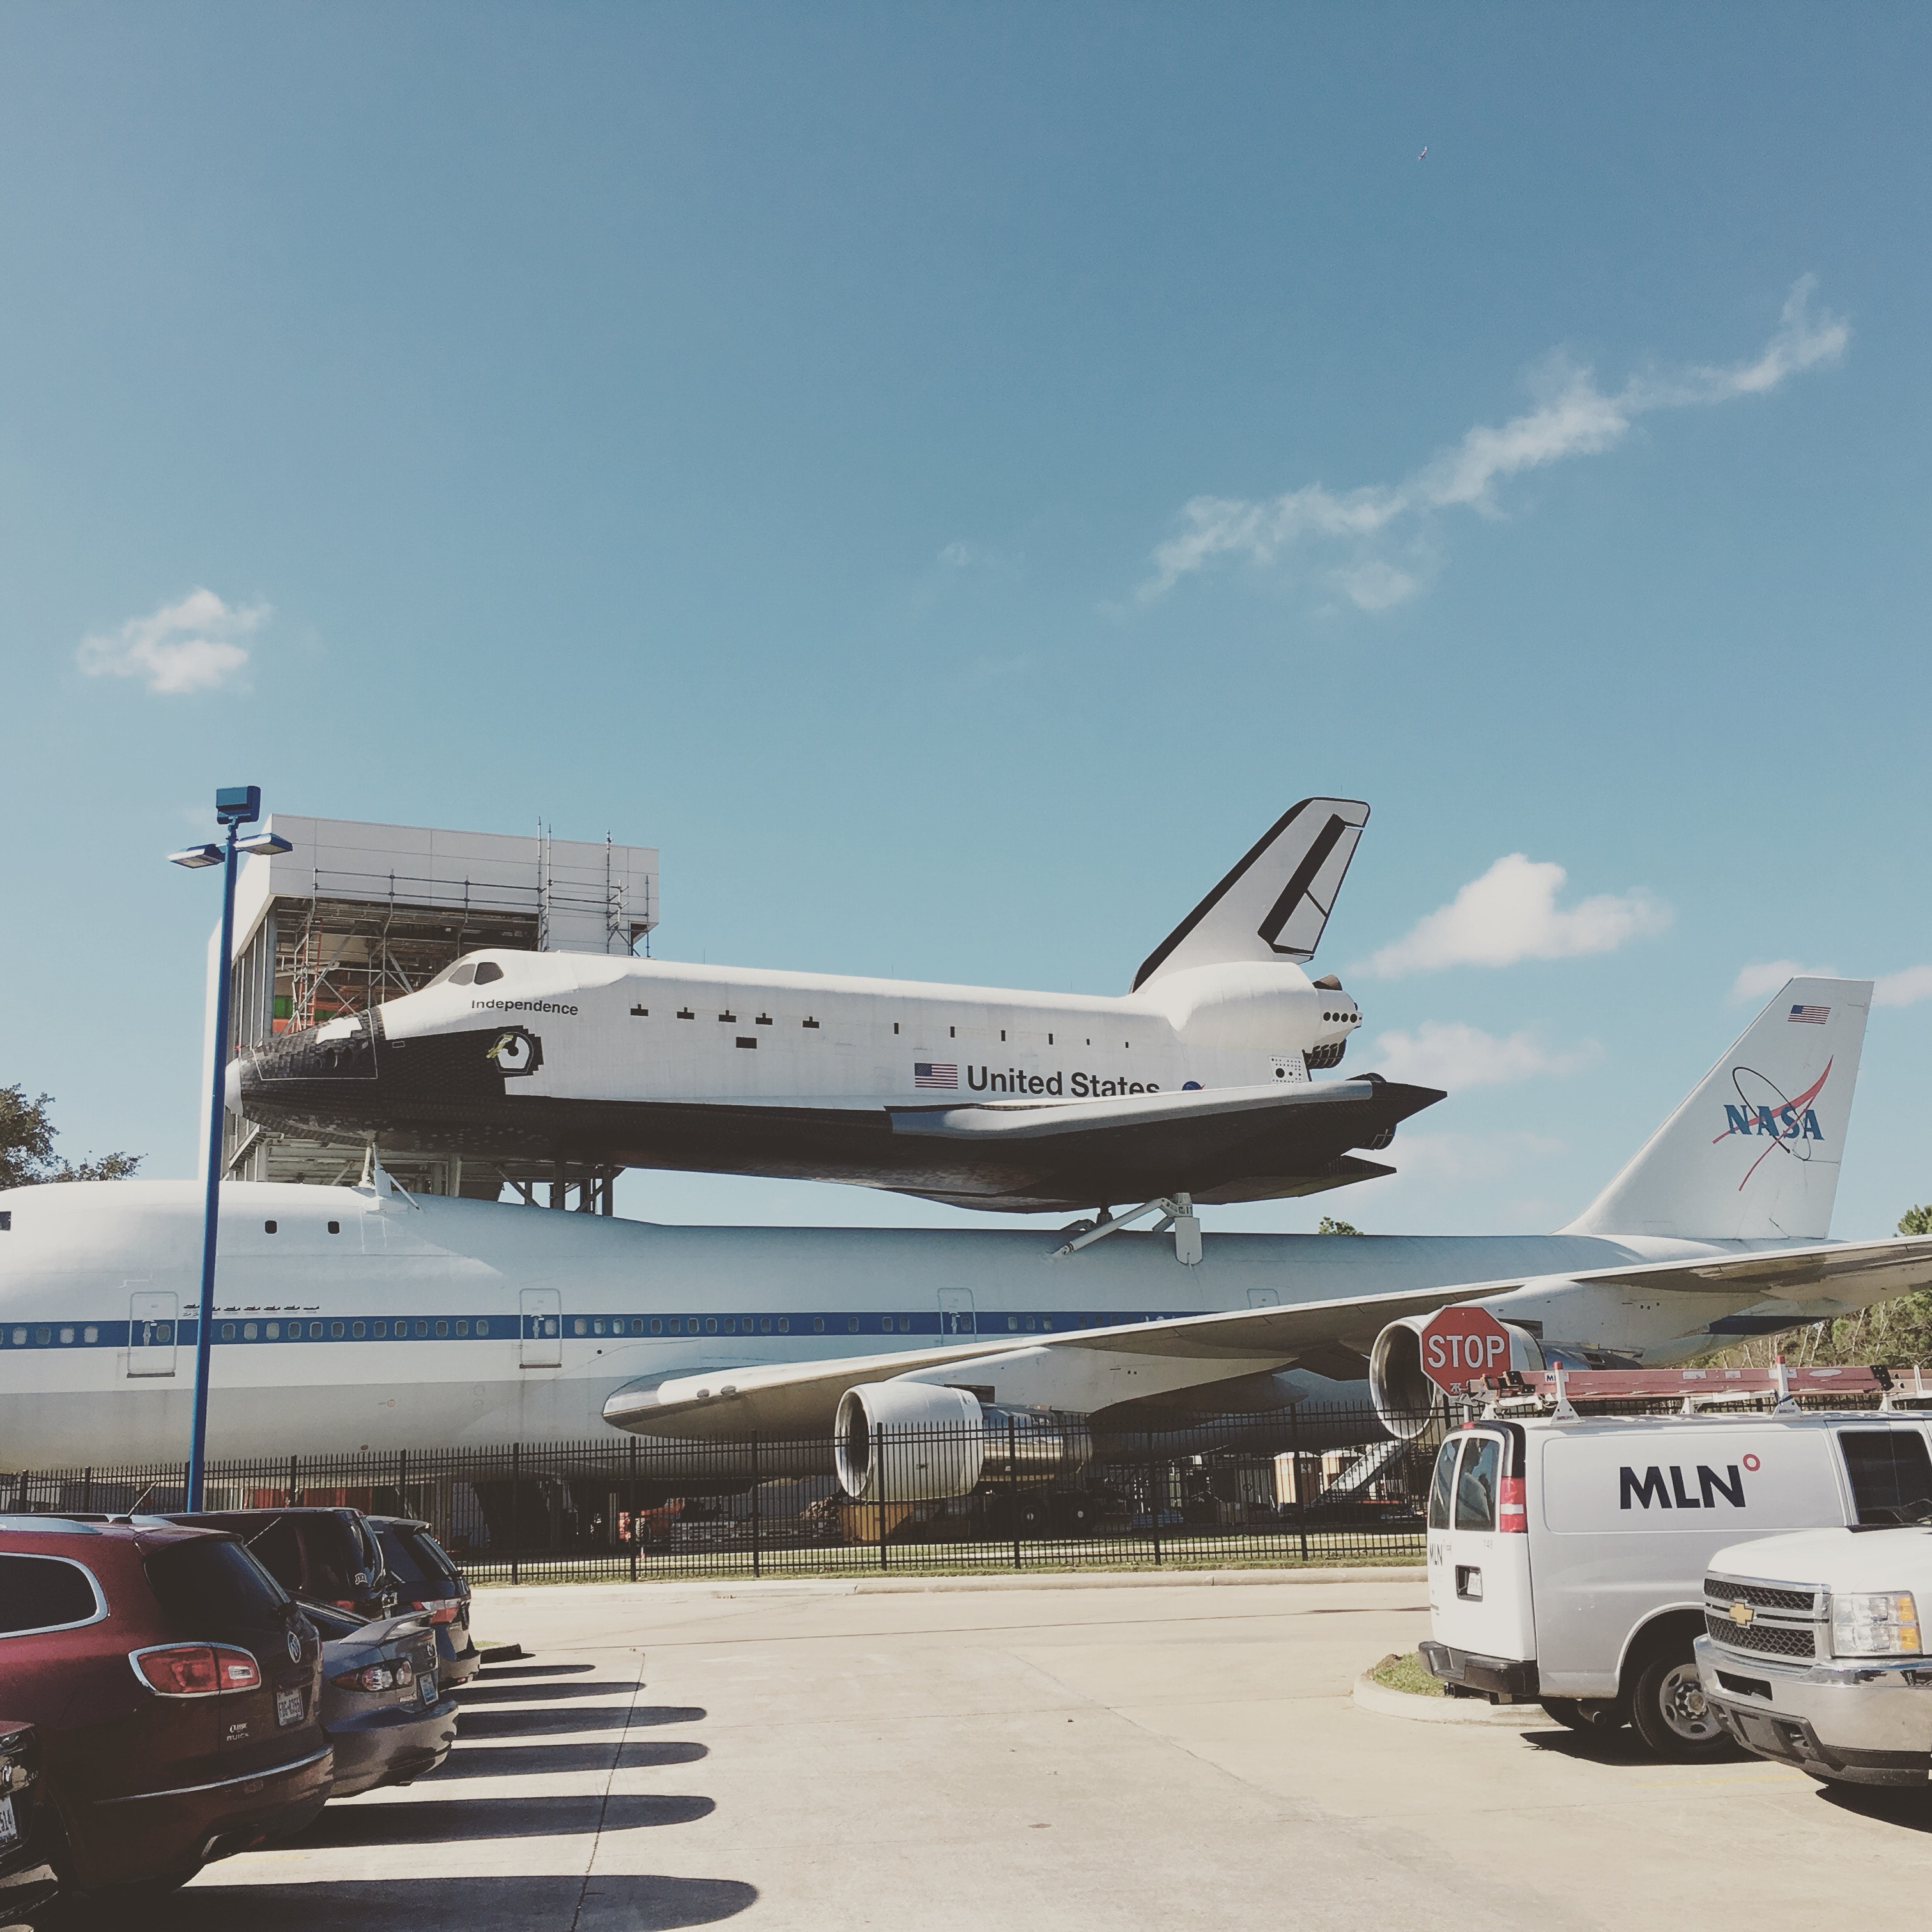 Photo Of Gray Airplane Free Stock